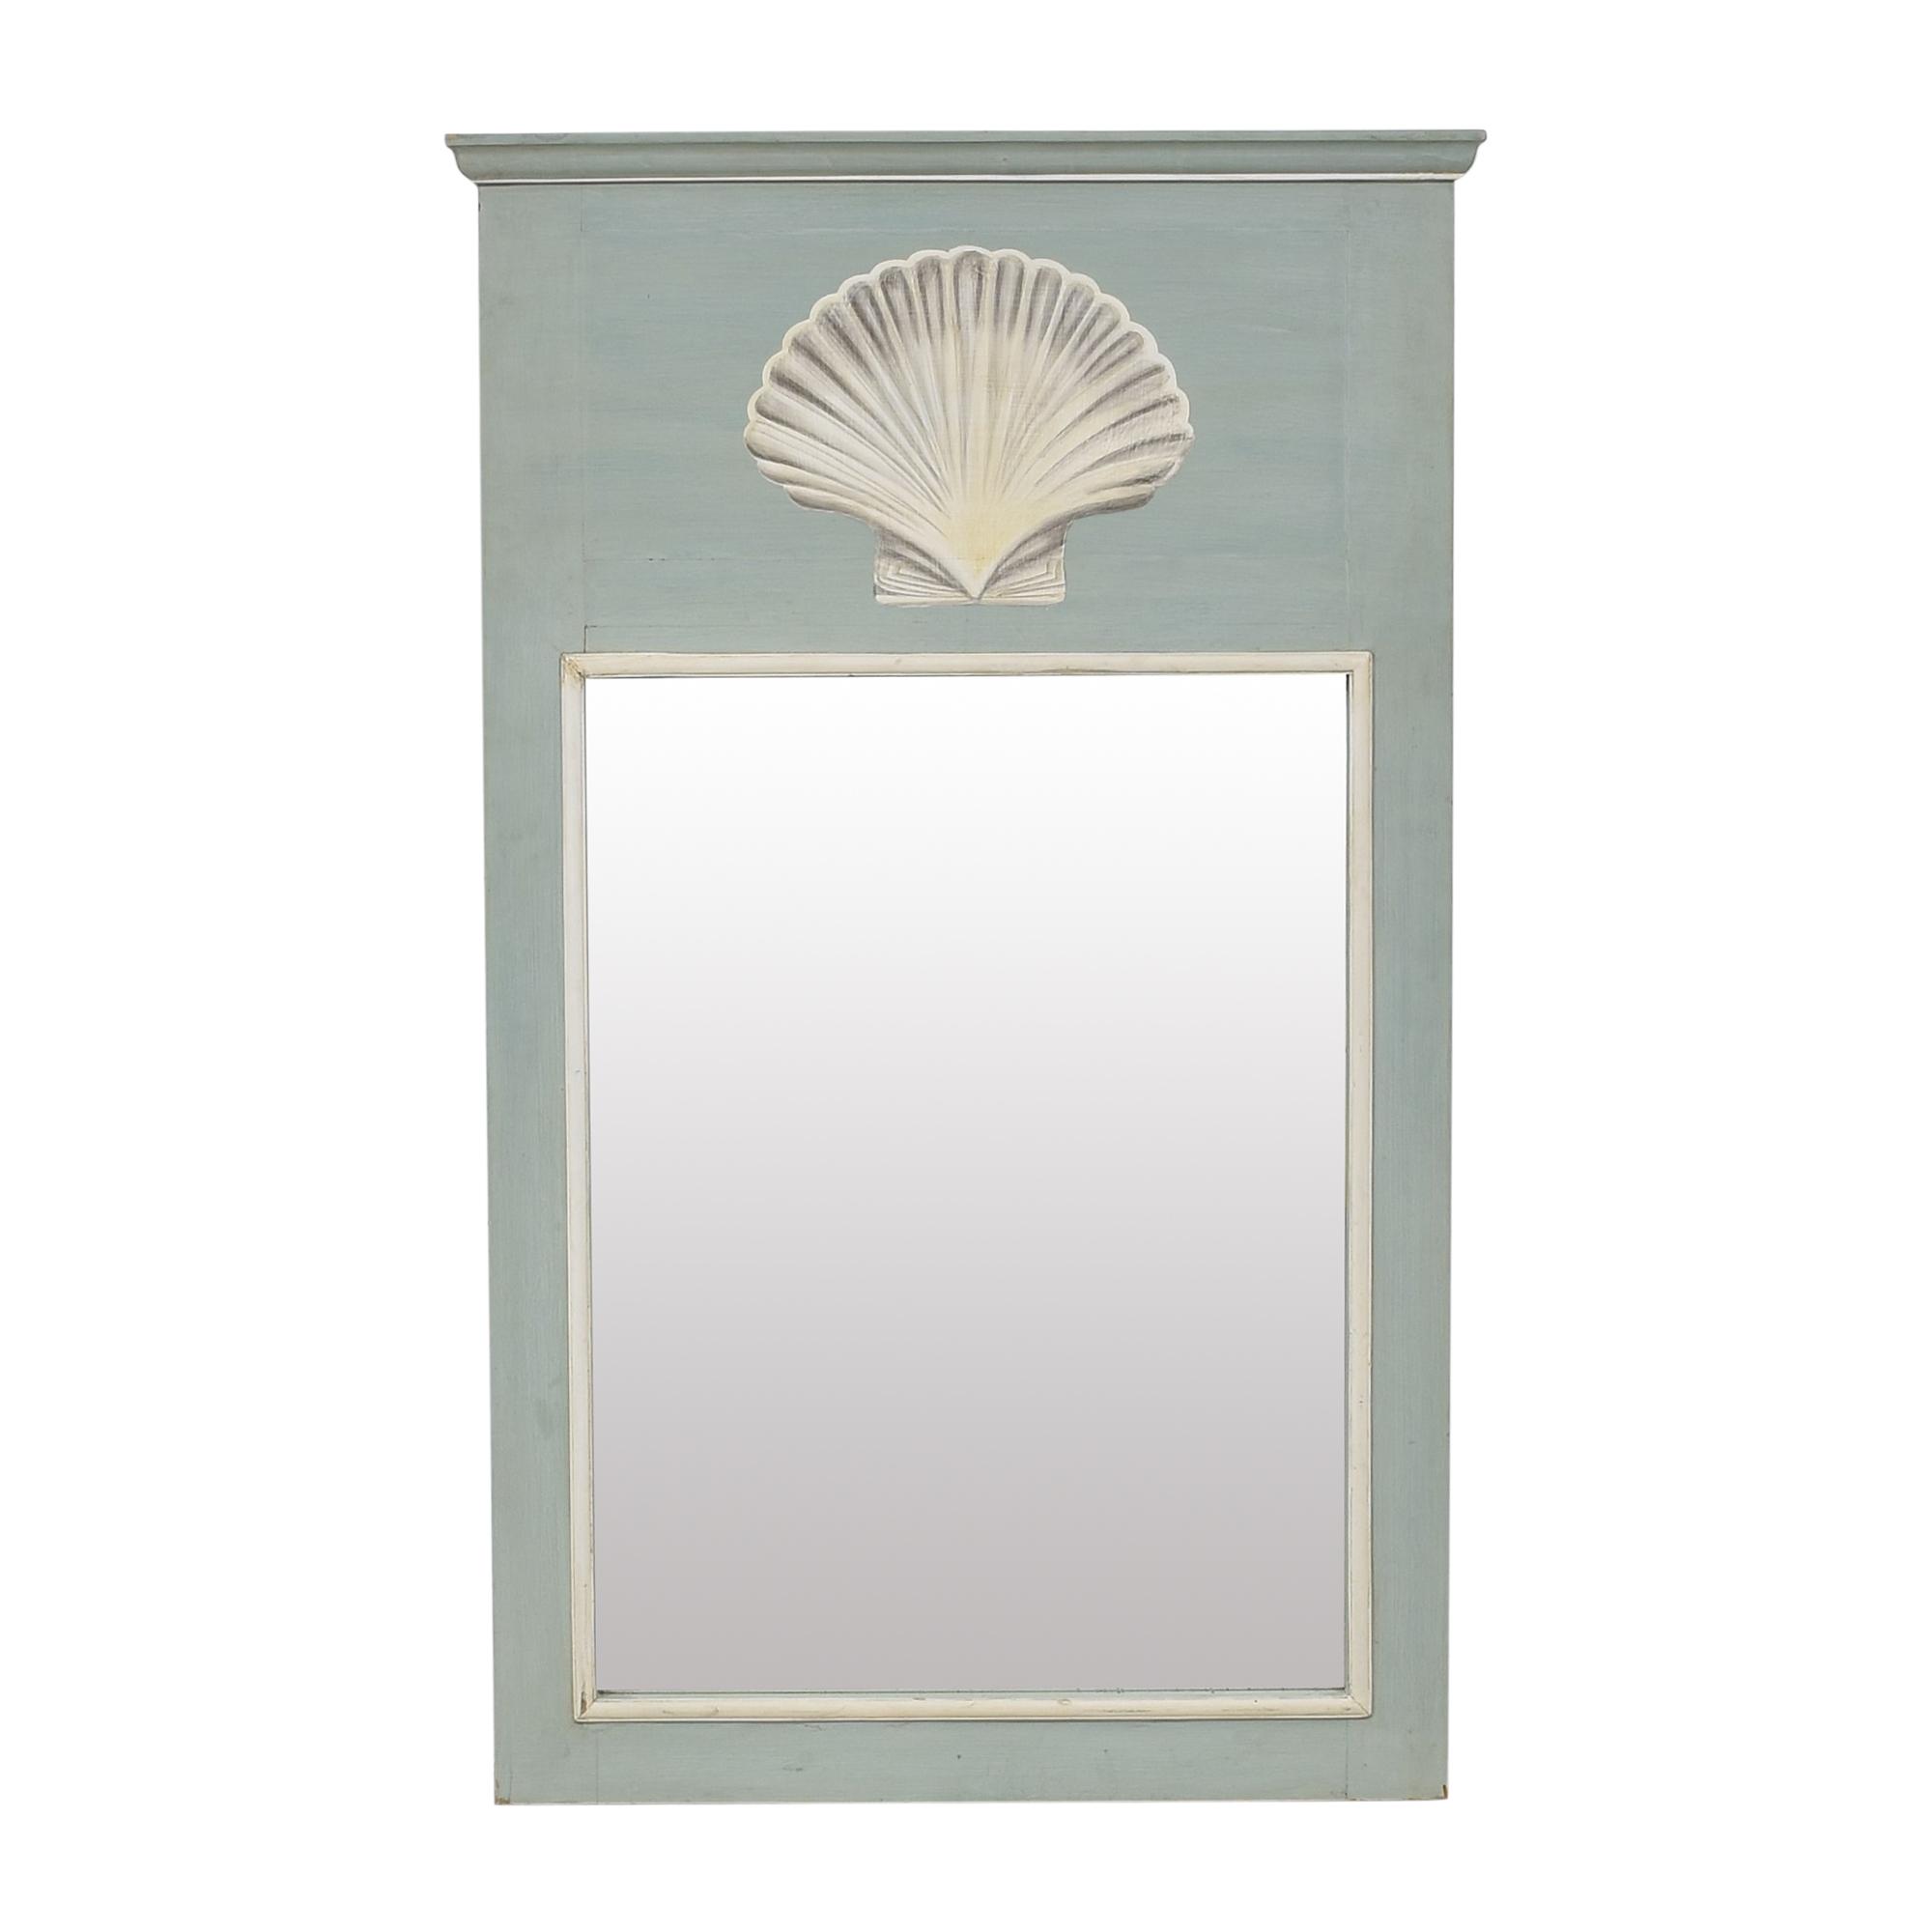 Coastal Style Decorative Mirror / Decor